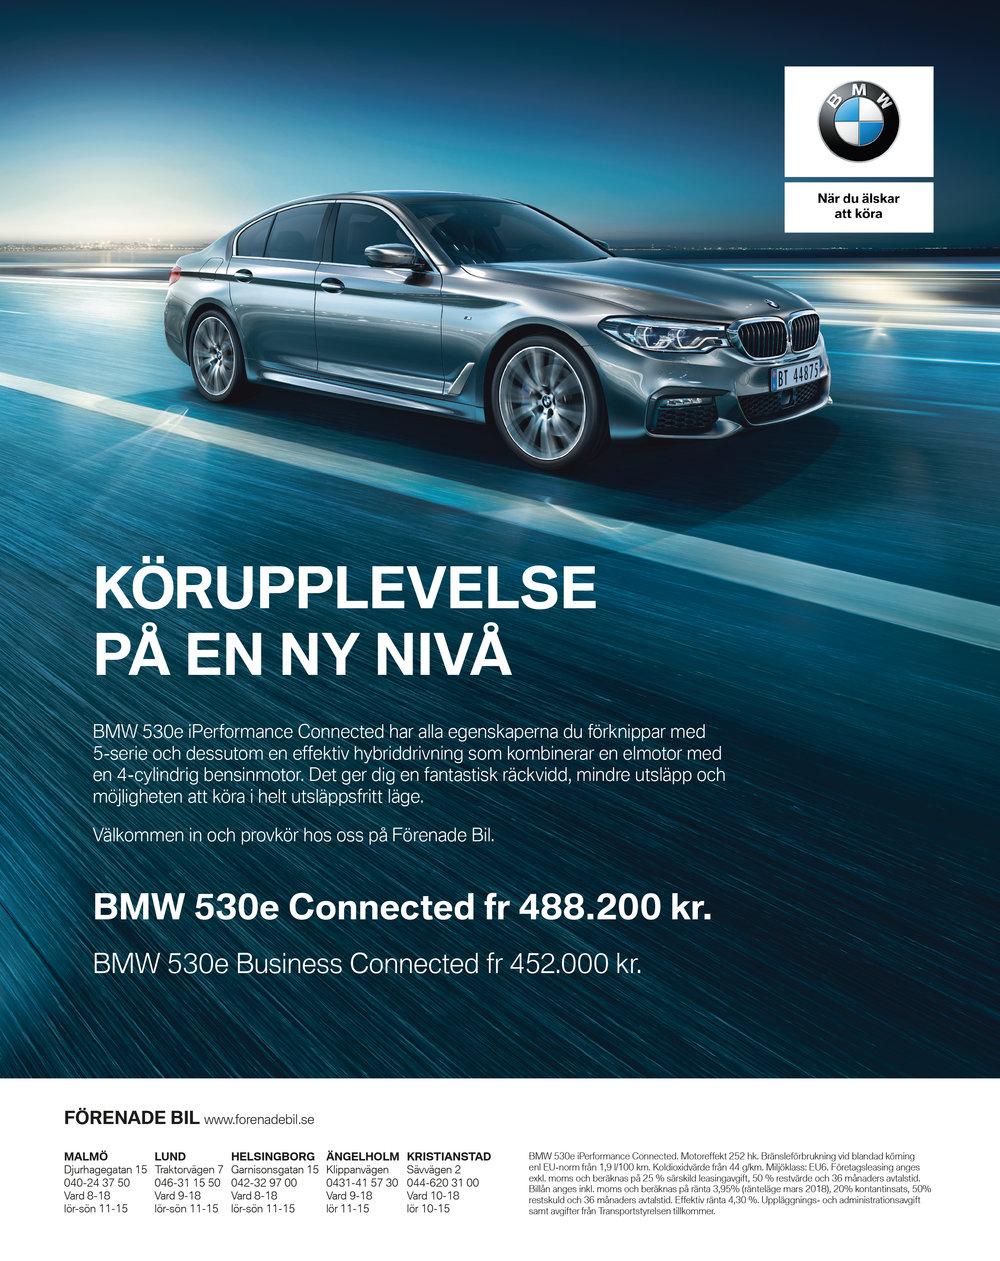 Printannons: Förenade Bil | BMW